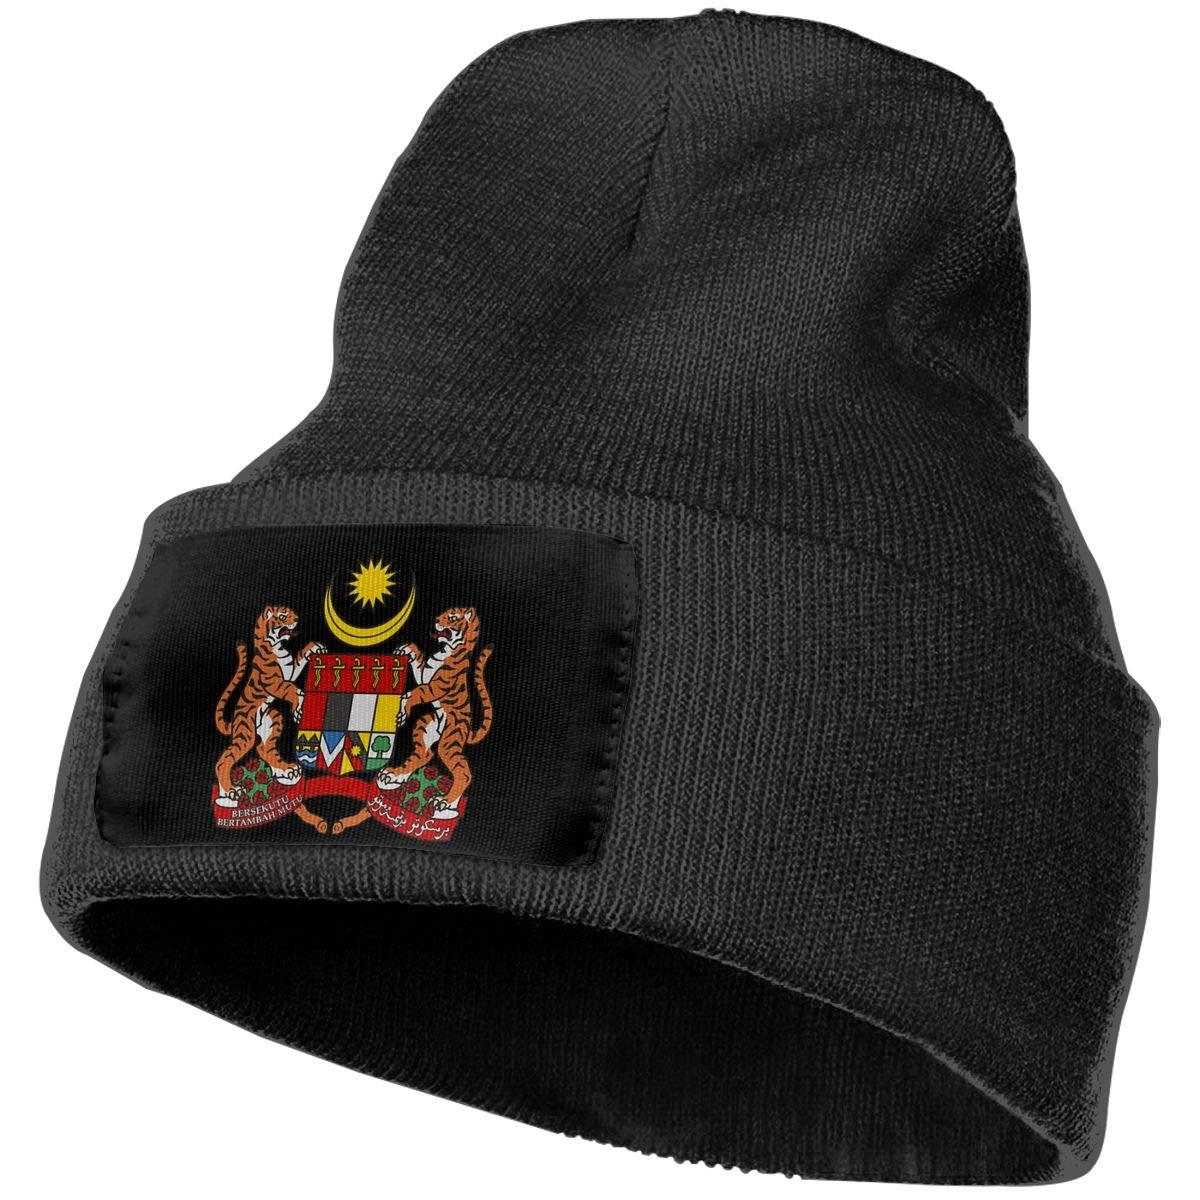 FORDSAN CP Malaysian Arms Mens Beanie Cap Skull Cap Winter Warm Knitting Hats.